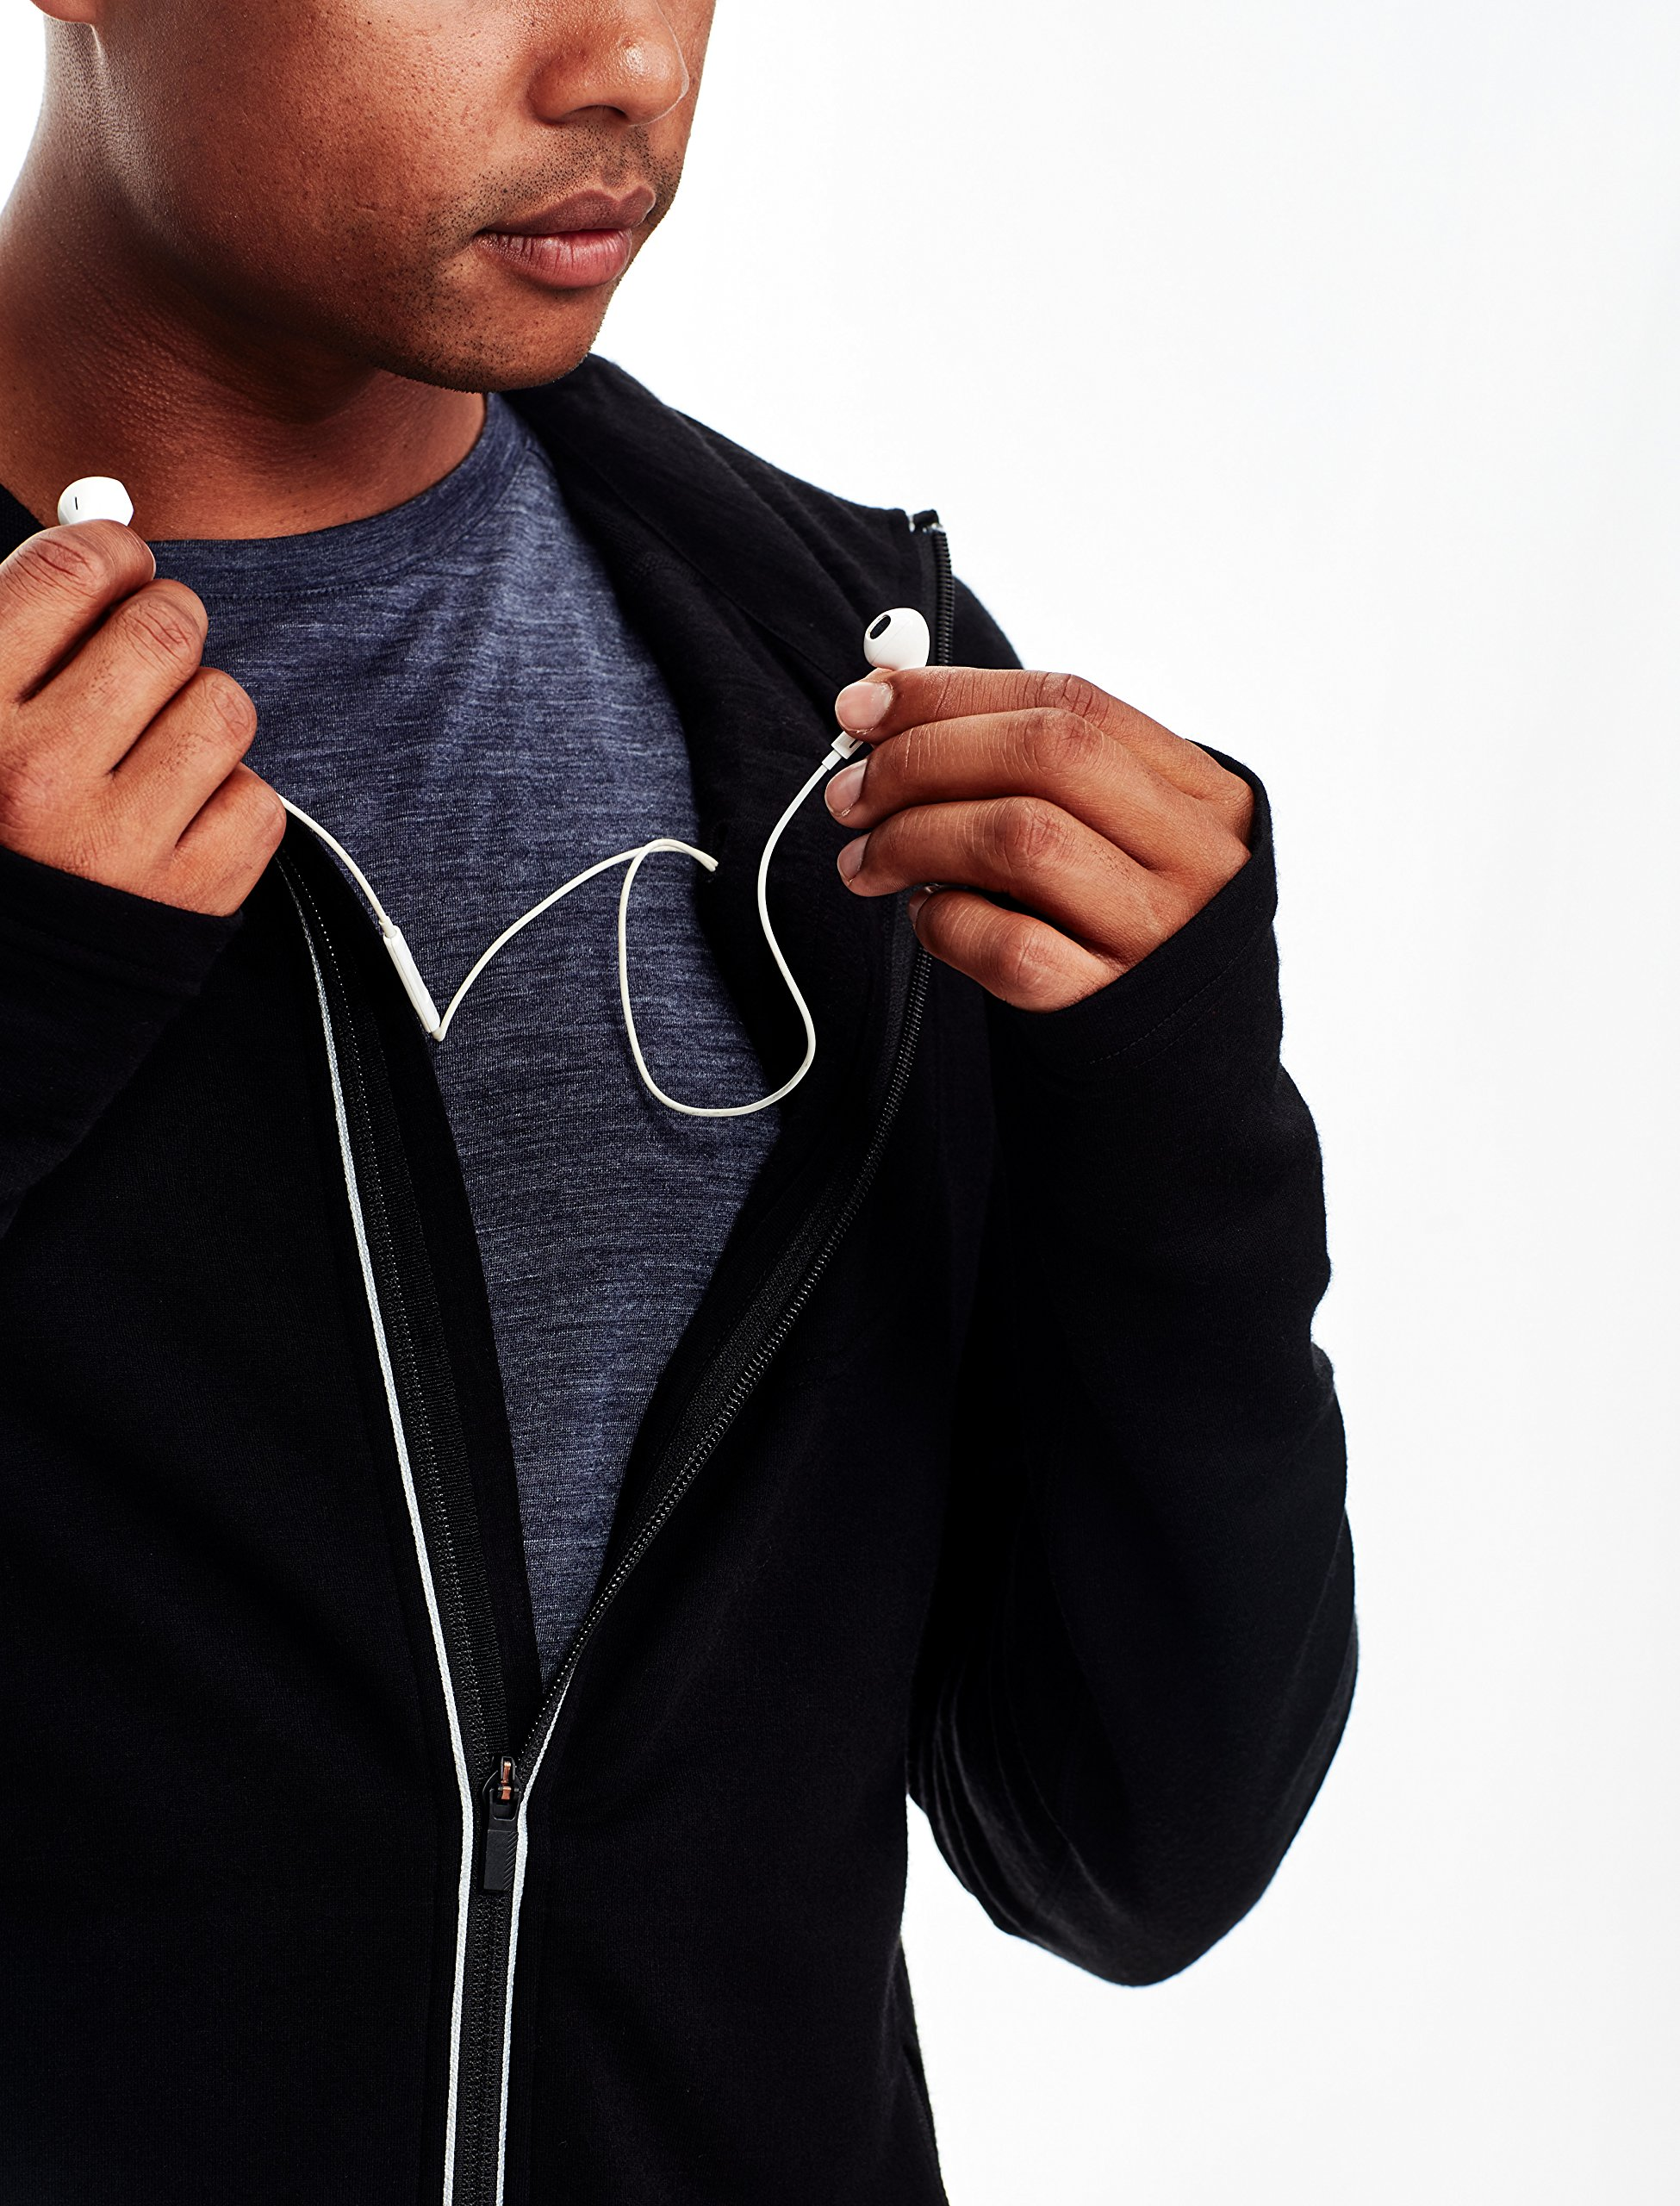 91ADzDO5e4L - Icebreaker Men's Quantum Long Sleeve Zip Hood Cover Ups